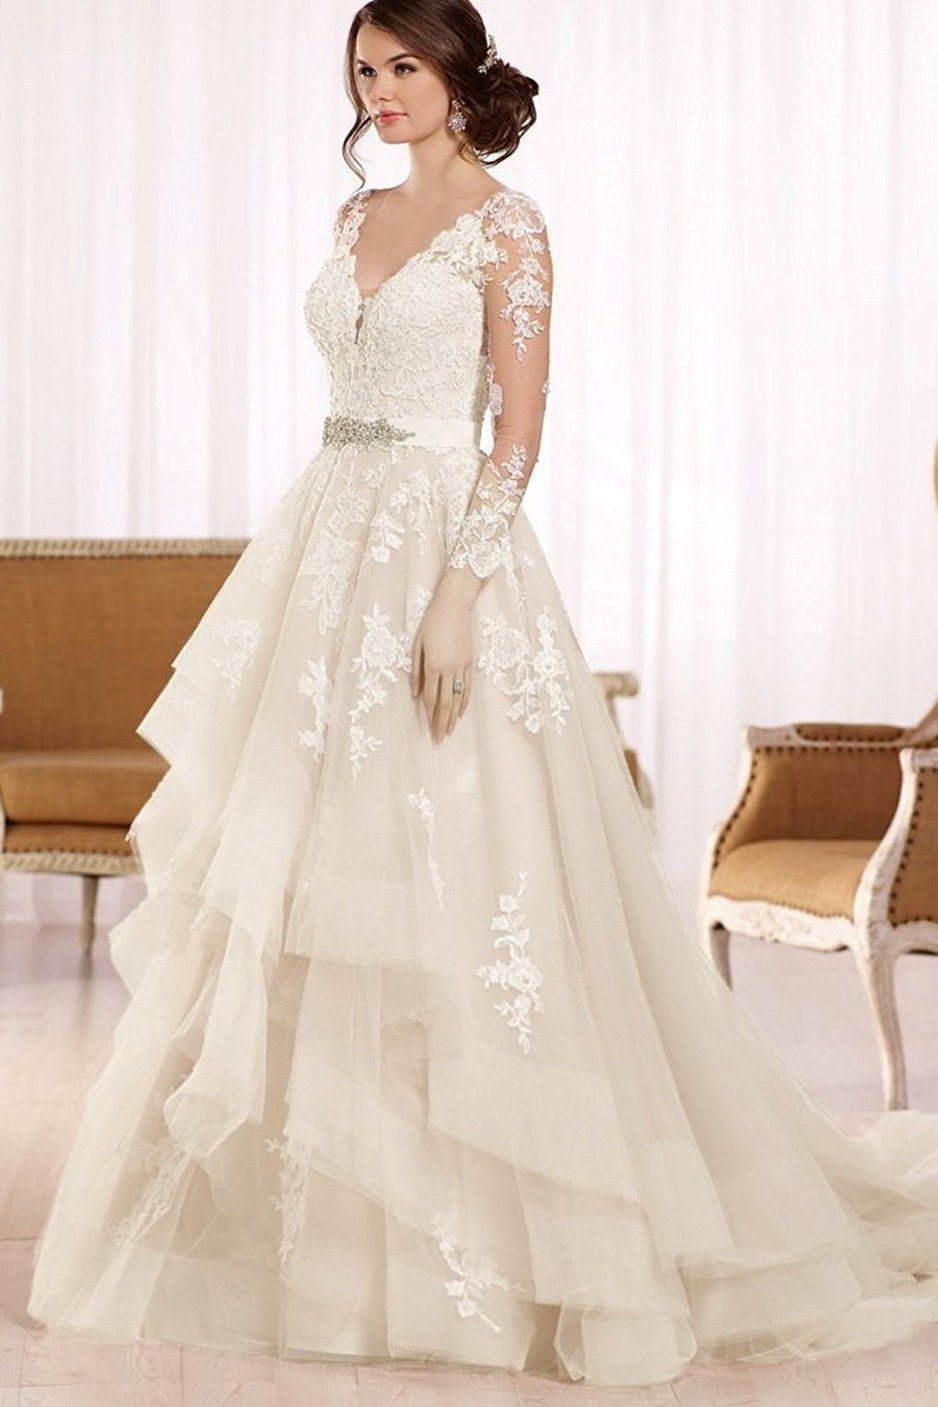 20 Gorgeous Wedding Dresses You Won T Believe You Can Get On Amazon Wedding Dress Trends Wedding Dress Sleeves Wedding Dress Long Sleeve